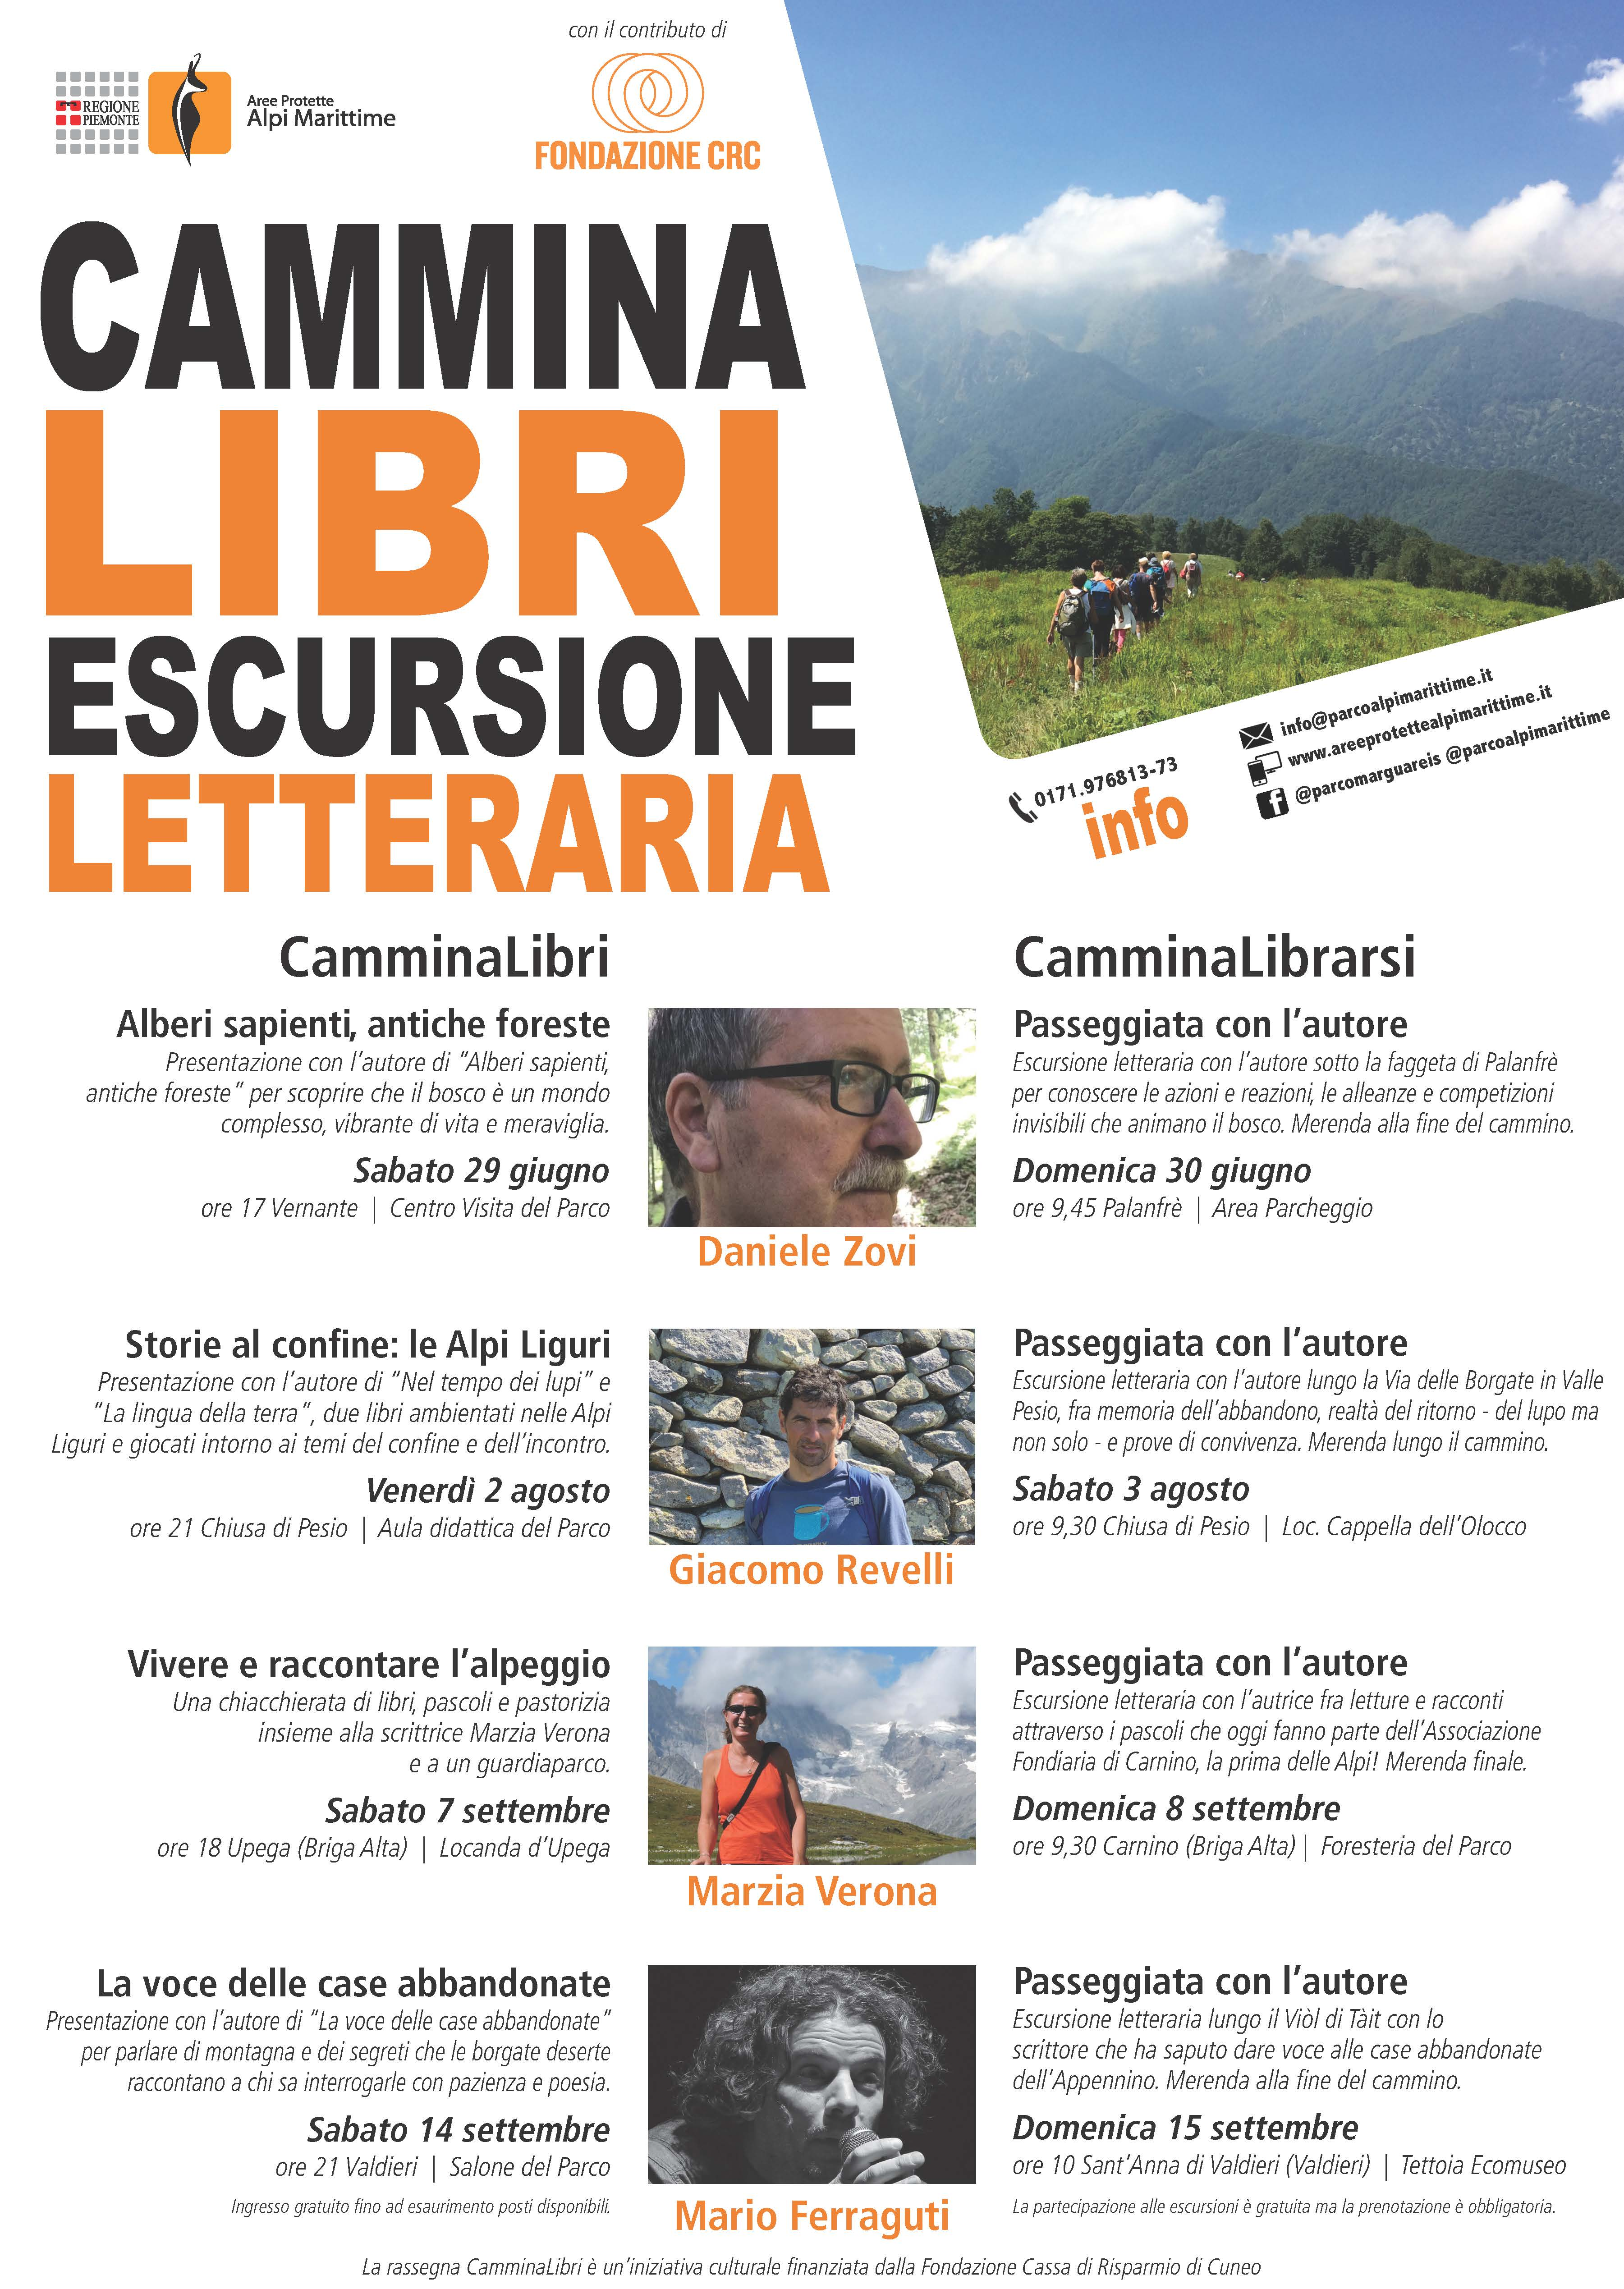 VALDIERI: Cammina Libri 2019 con Mario Ferraguti